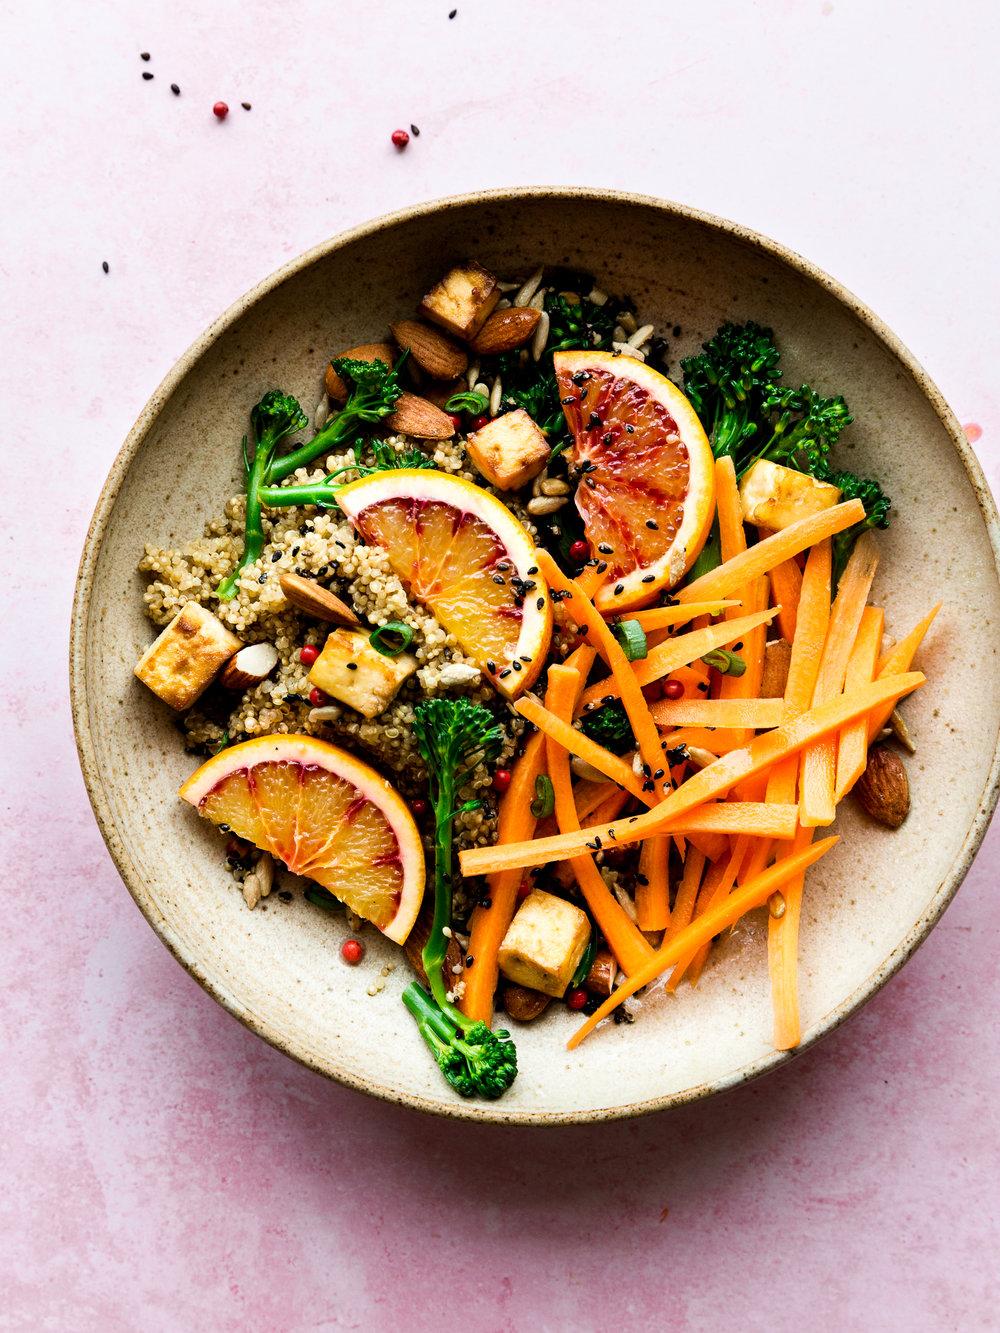 Easy vegan buddha bowl recipe - The Little Plantation blog